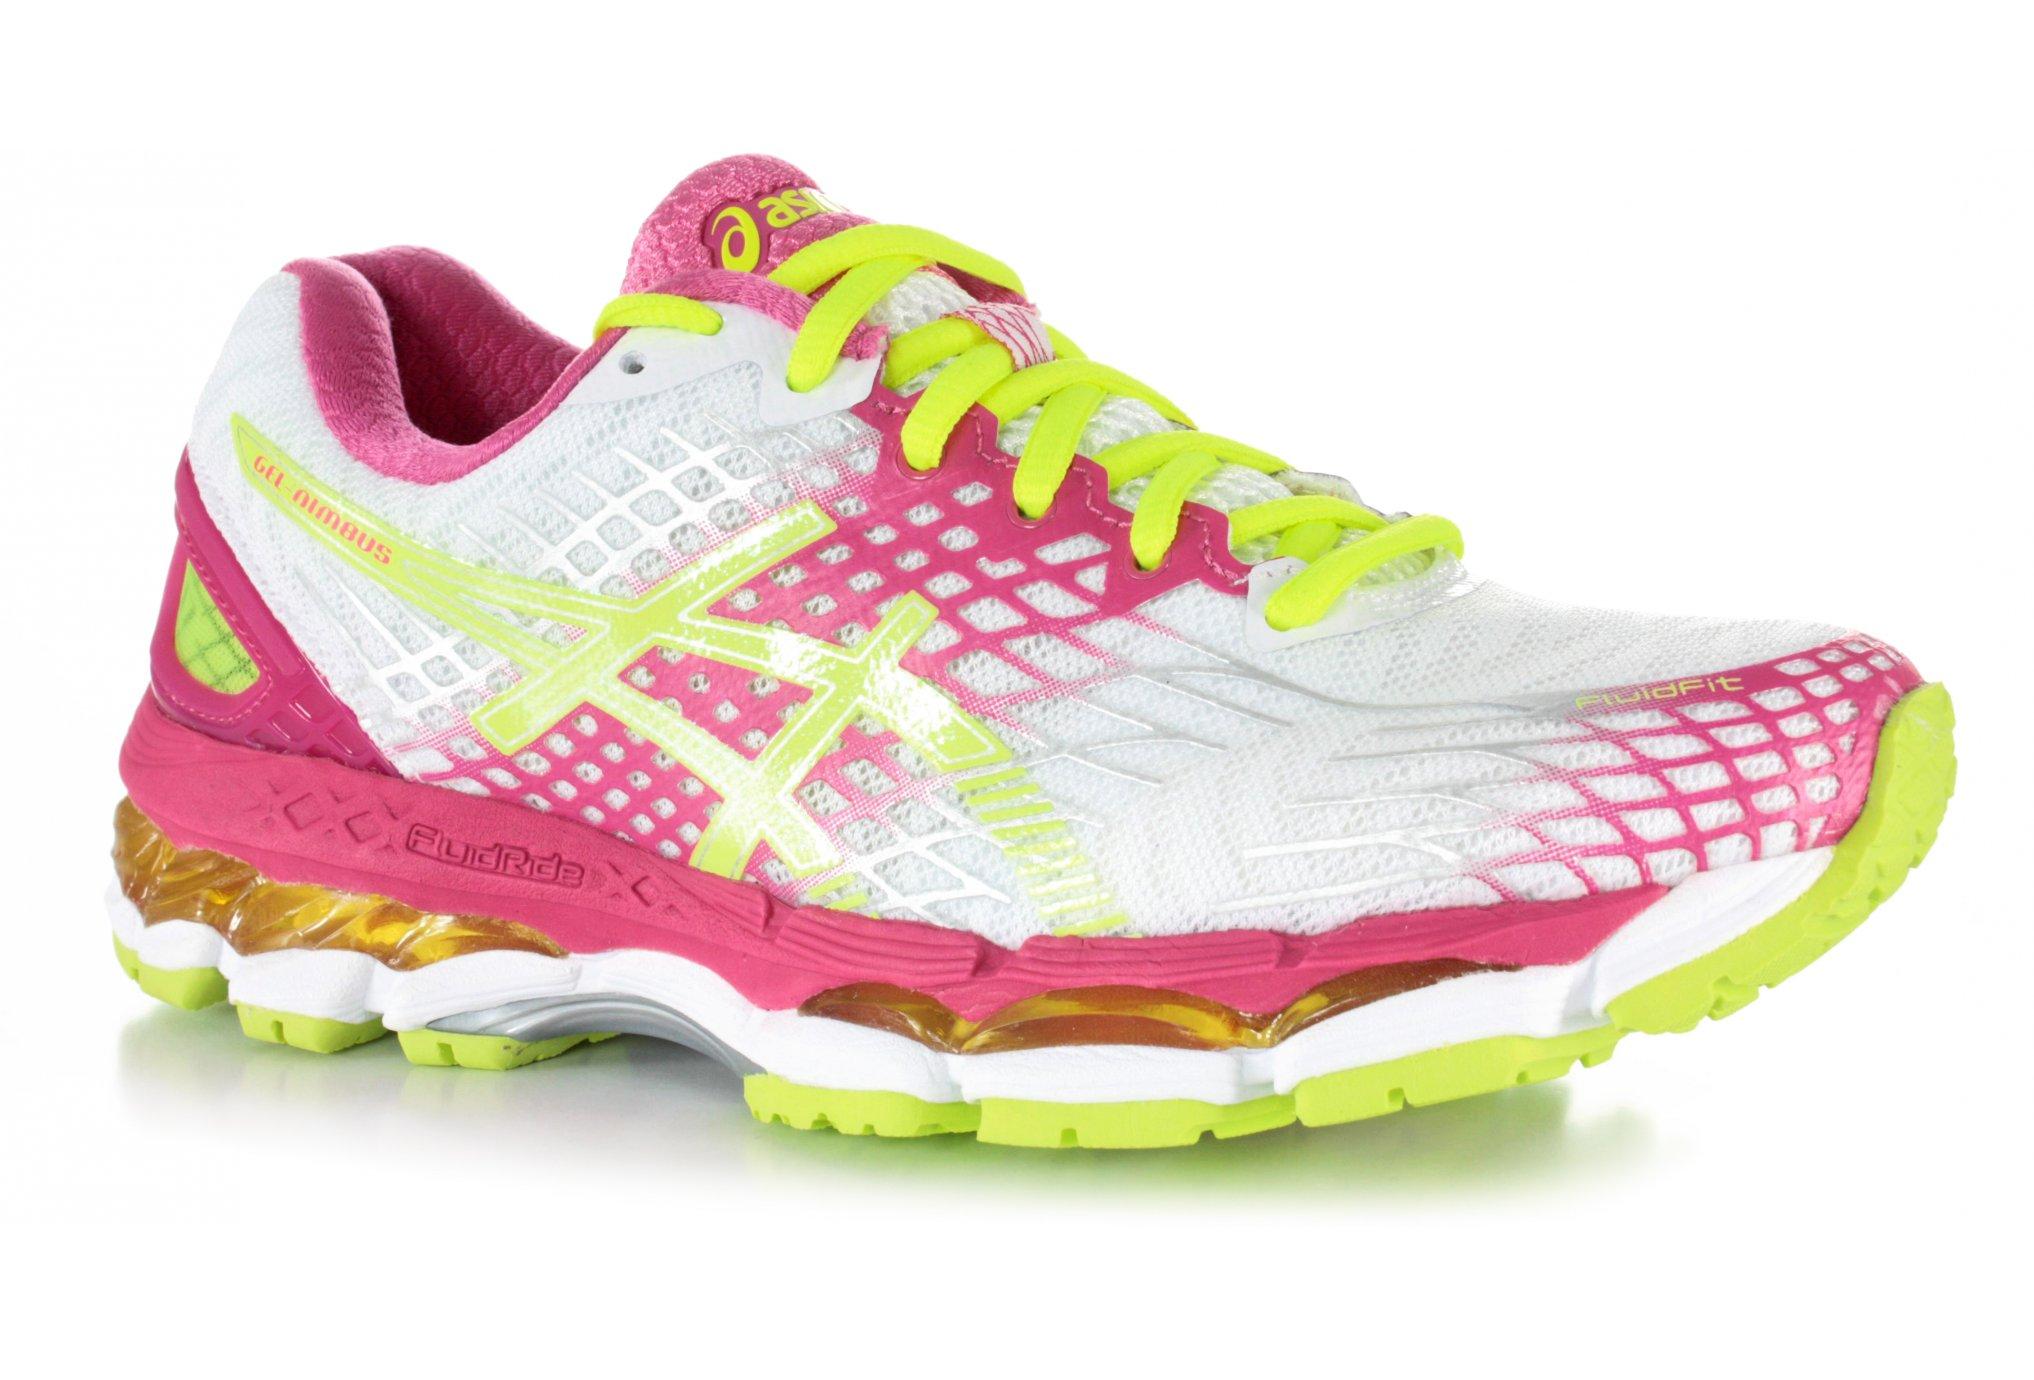 asics gel-nimbus 17 chaussures de running